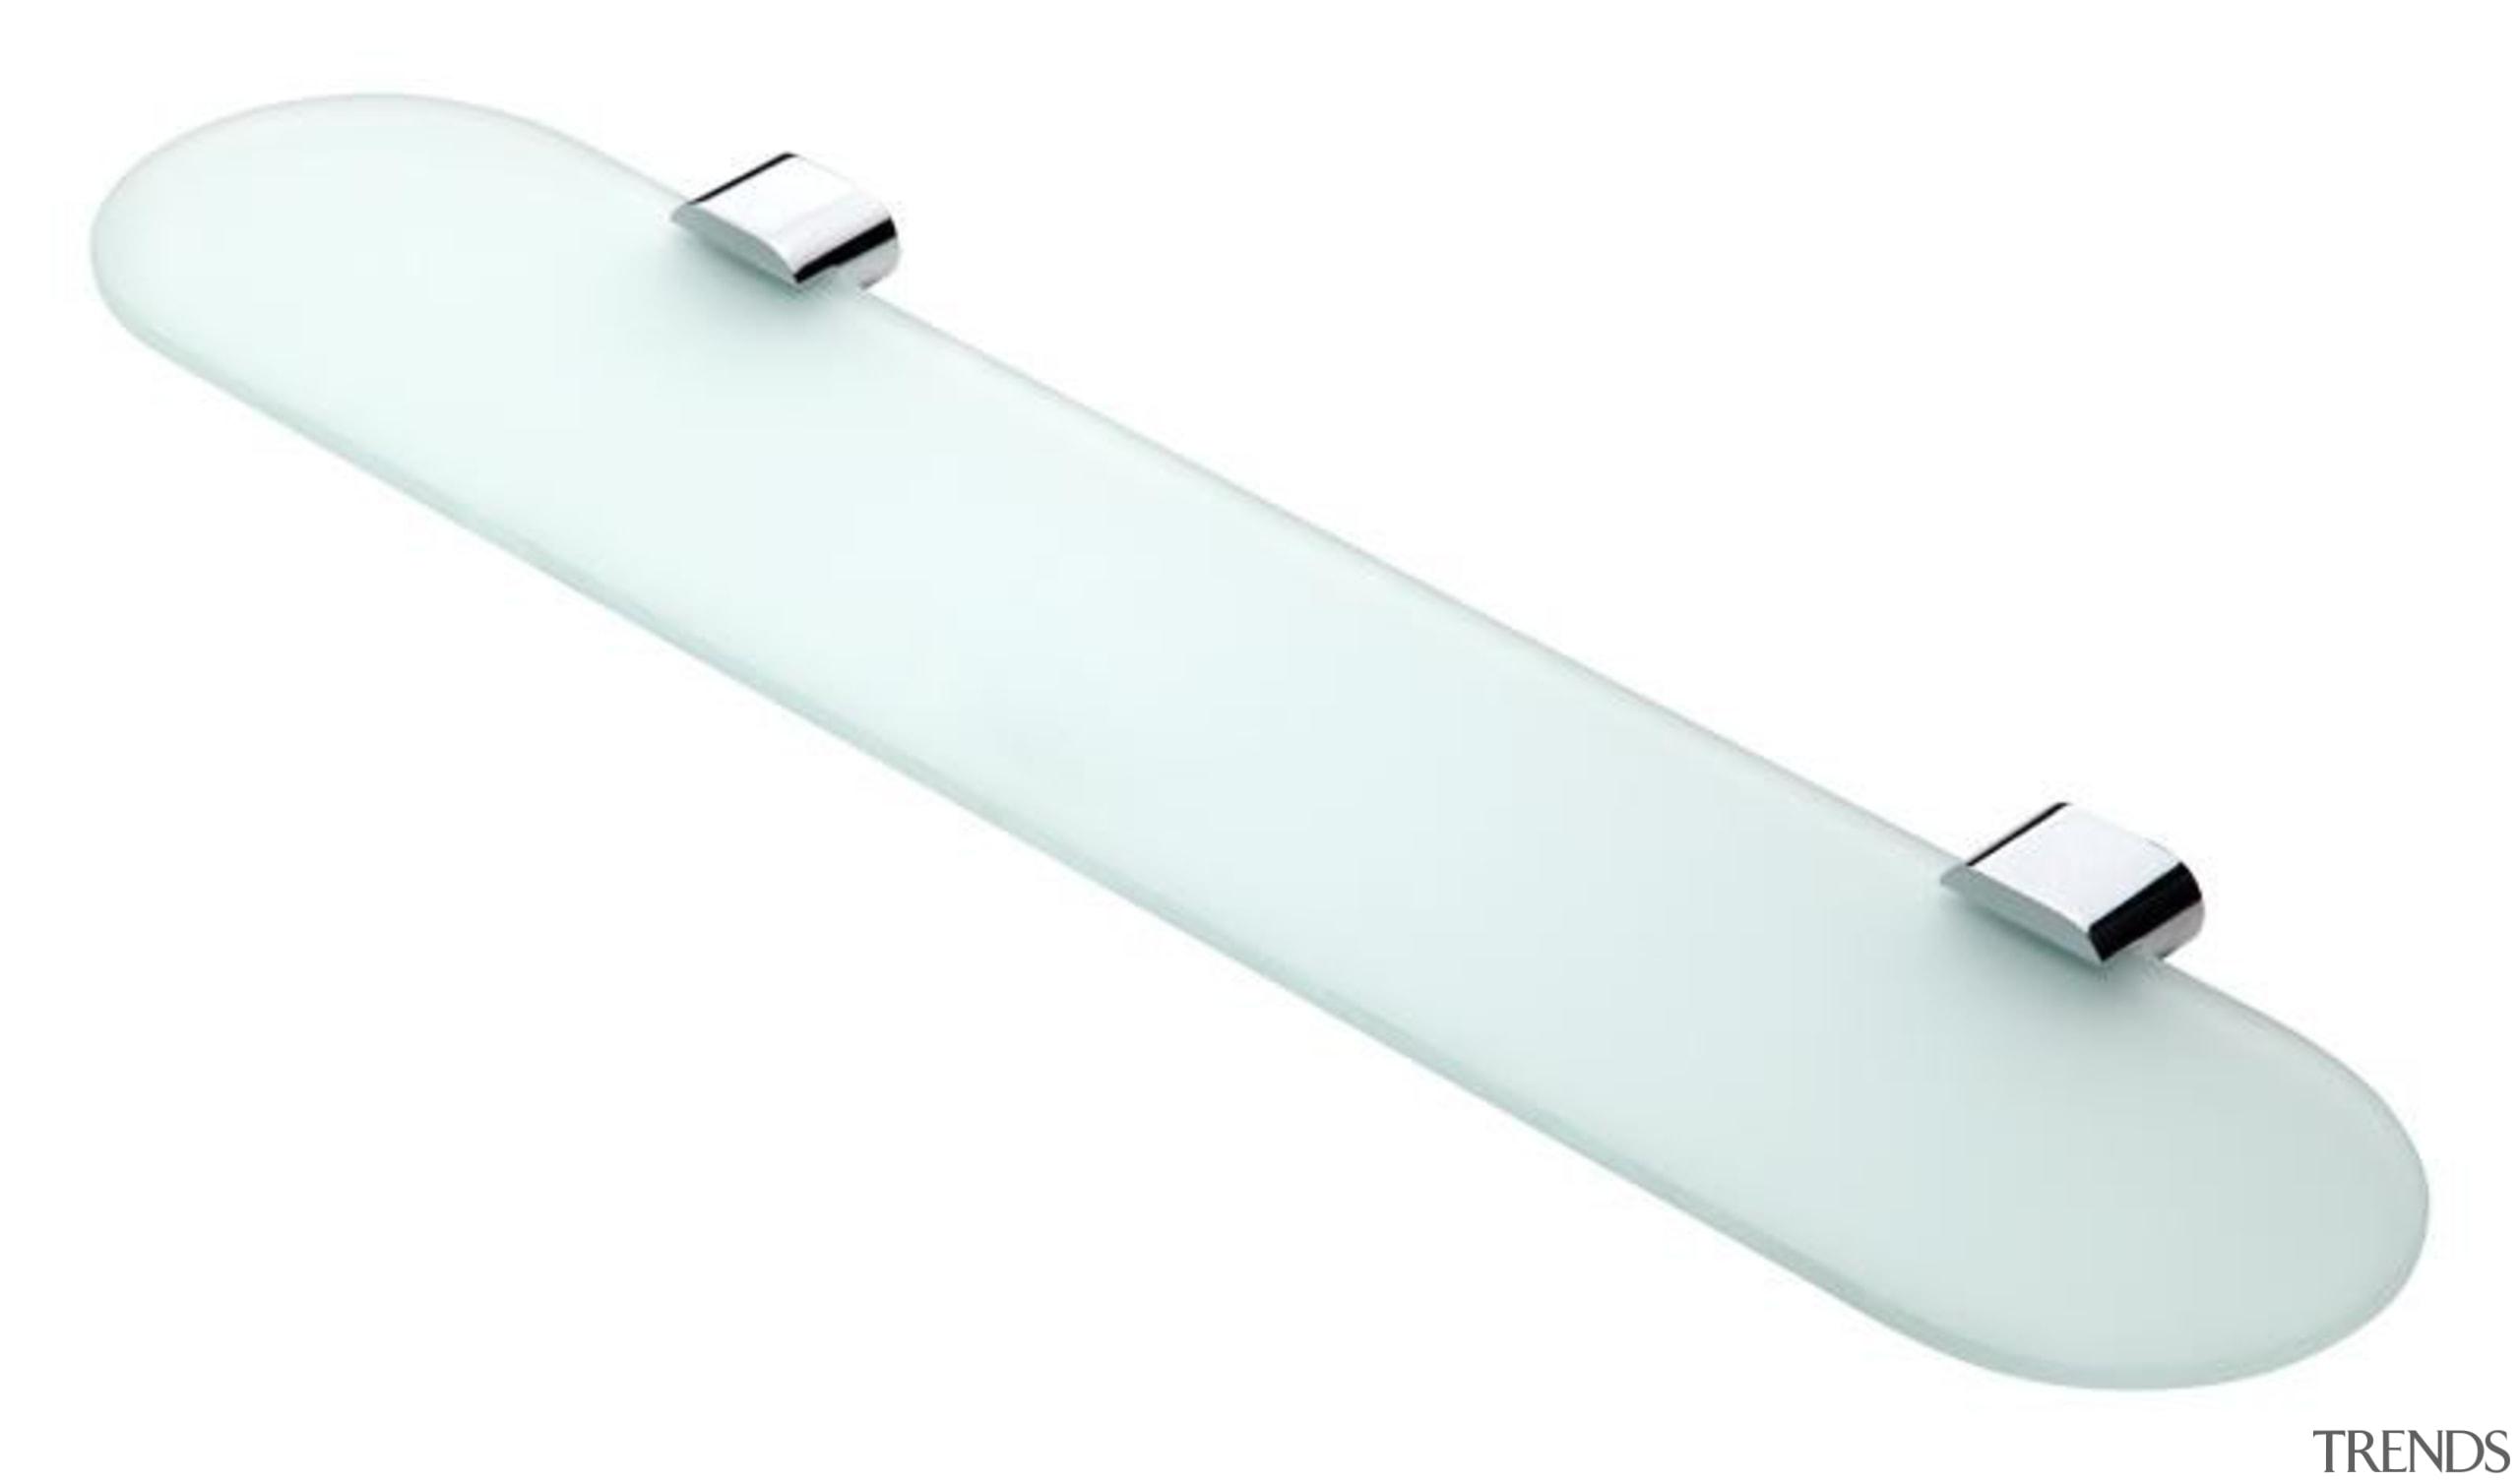 LOFT Glass Shelf (600mm) - LOFT Glass Shelf product design, white